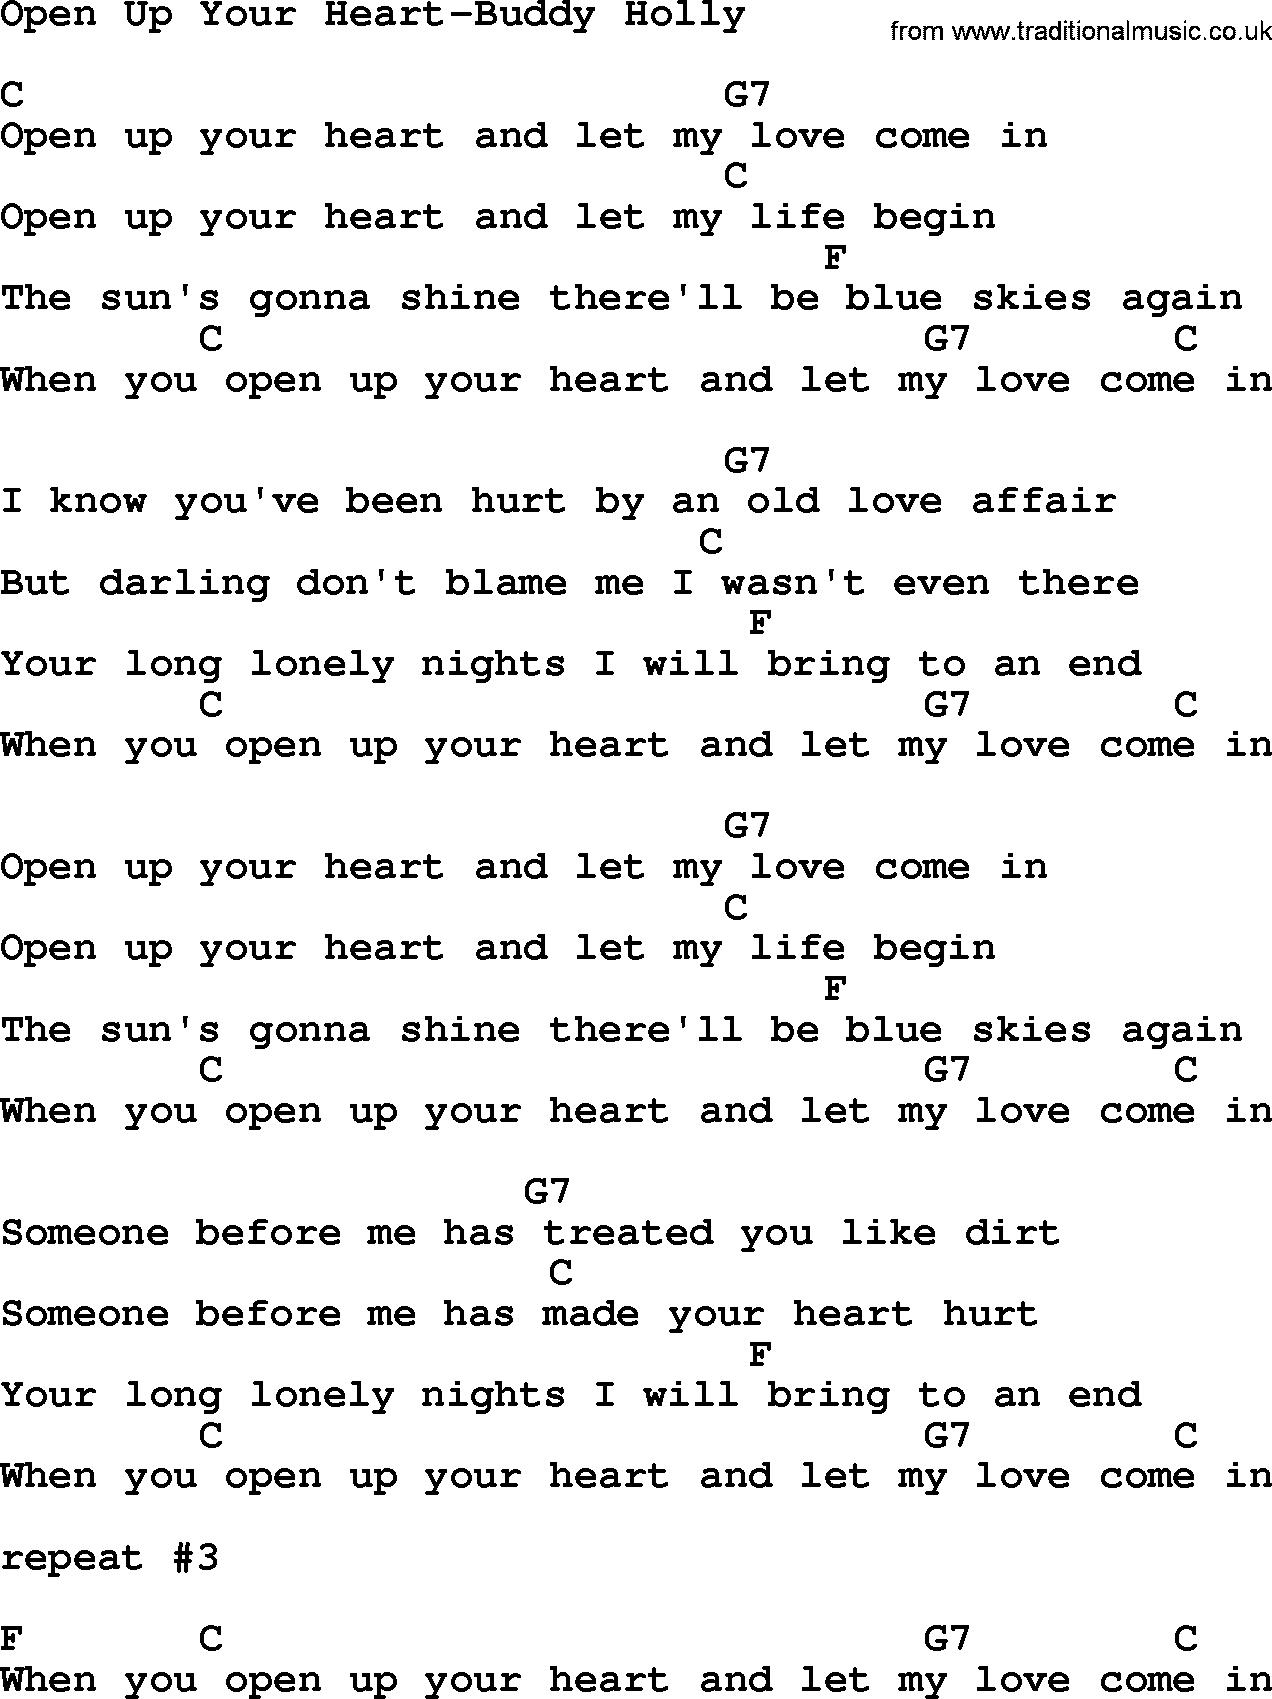 Buddy Holly Guitar Chords